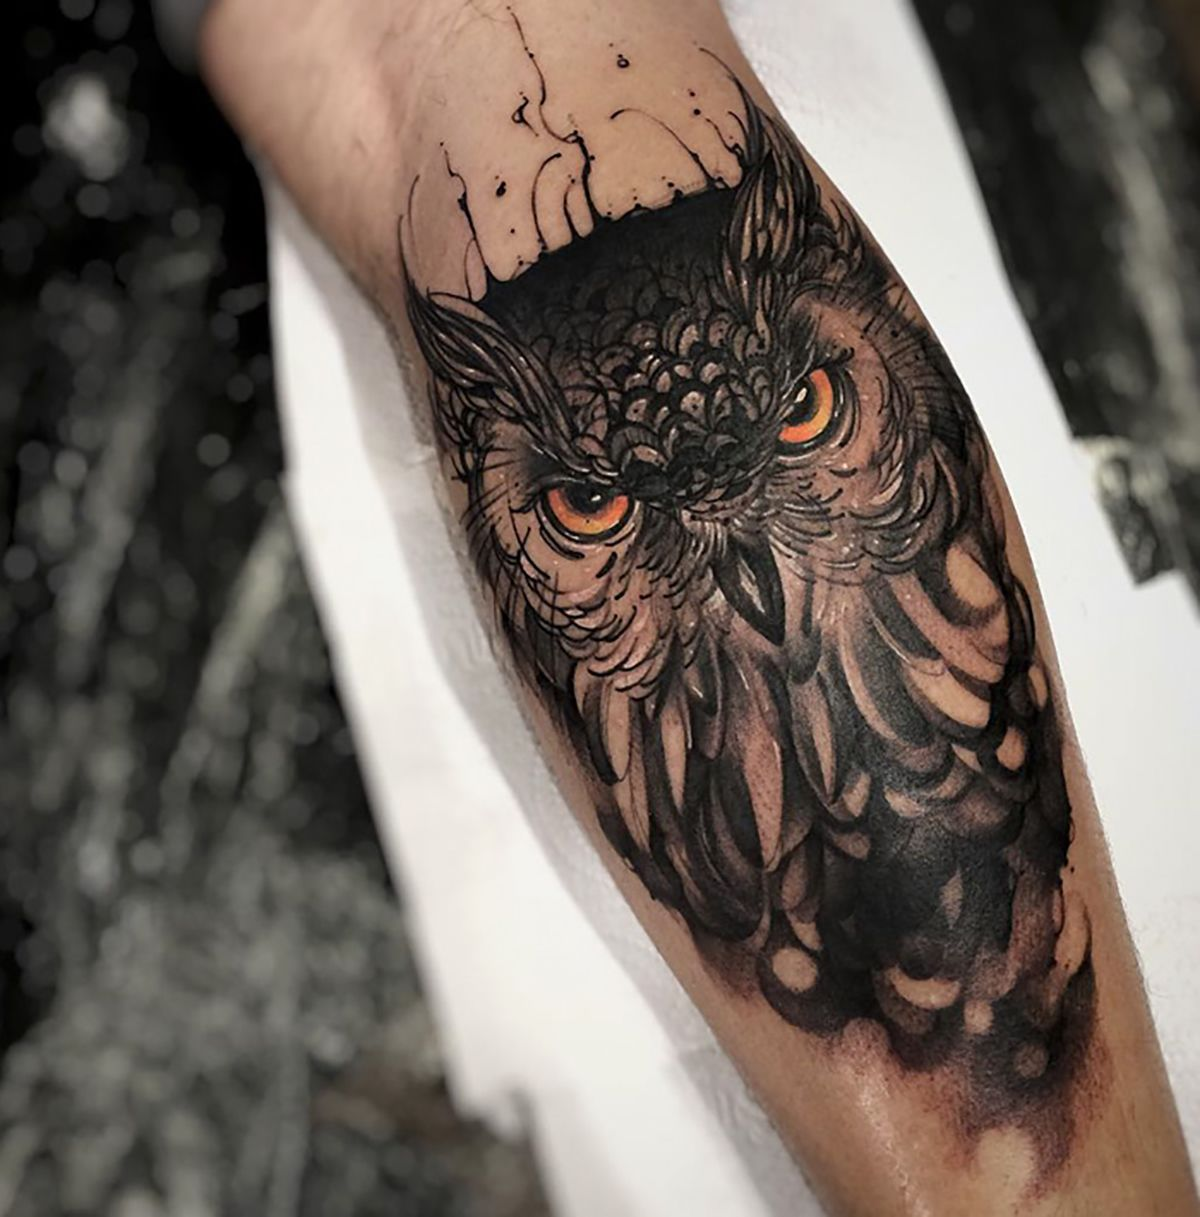 20 Tatuajes De Aves Que Te Harán Reflexionar Acerca Del Lugar Donde